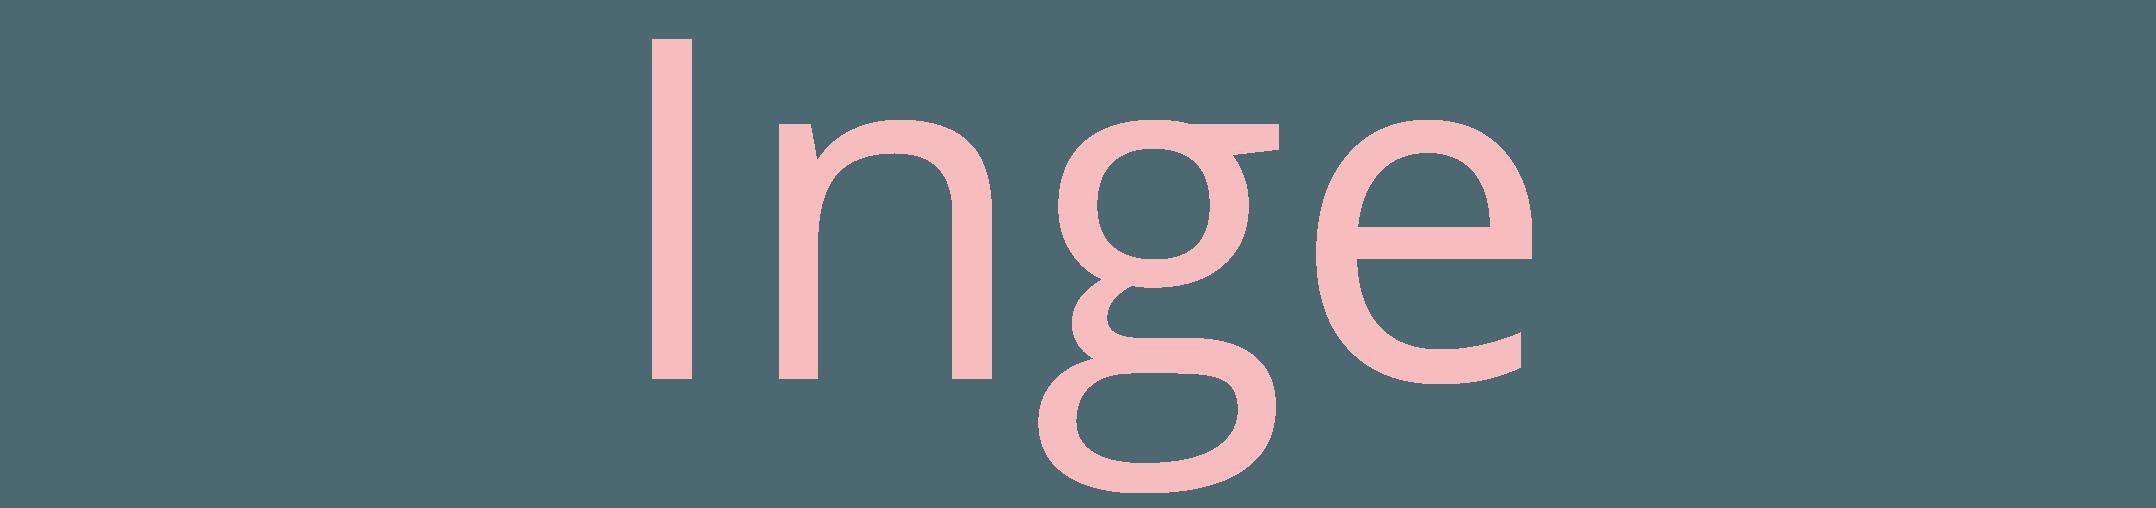 Haarstijl-Inge---slider-tekst-2